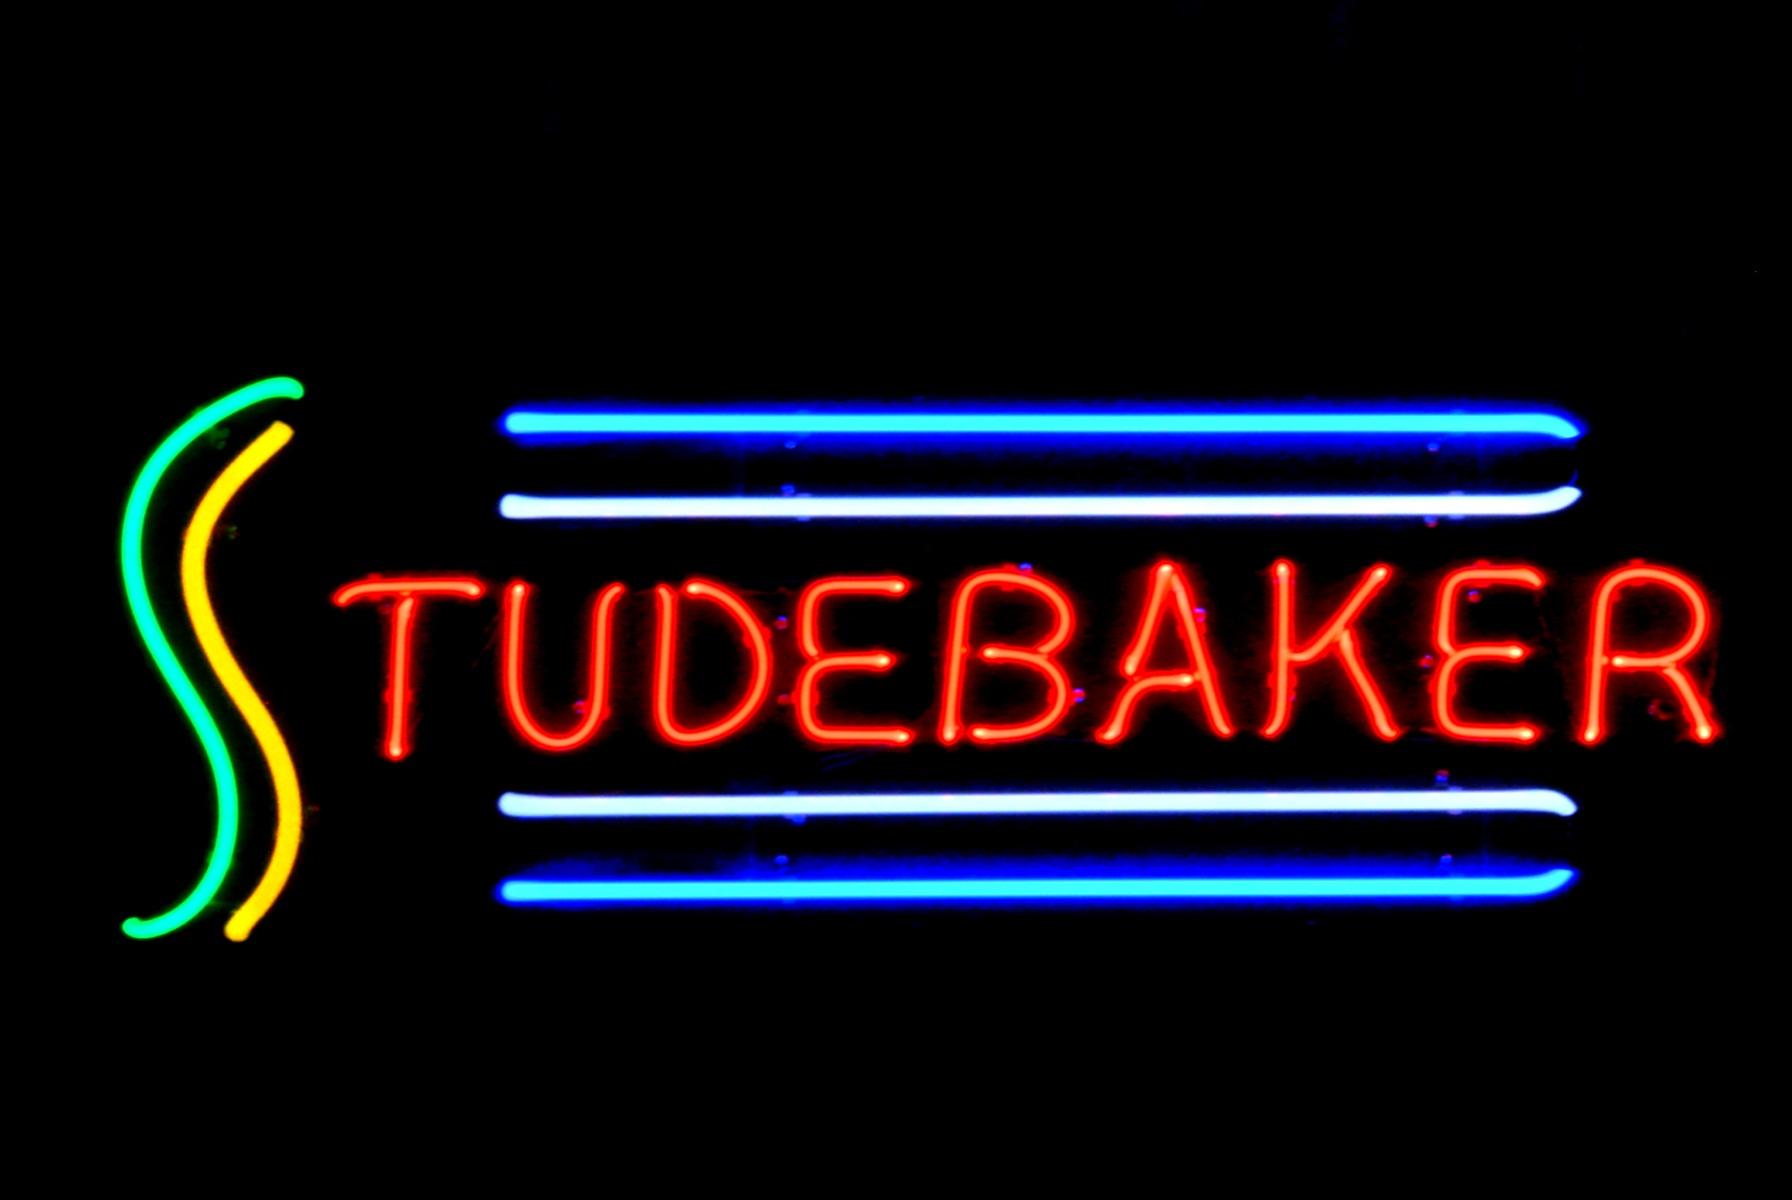 Studebaker Dealership Neon Signs by John Barton - BartonNeonMagic.com